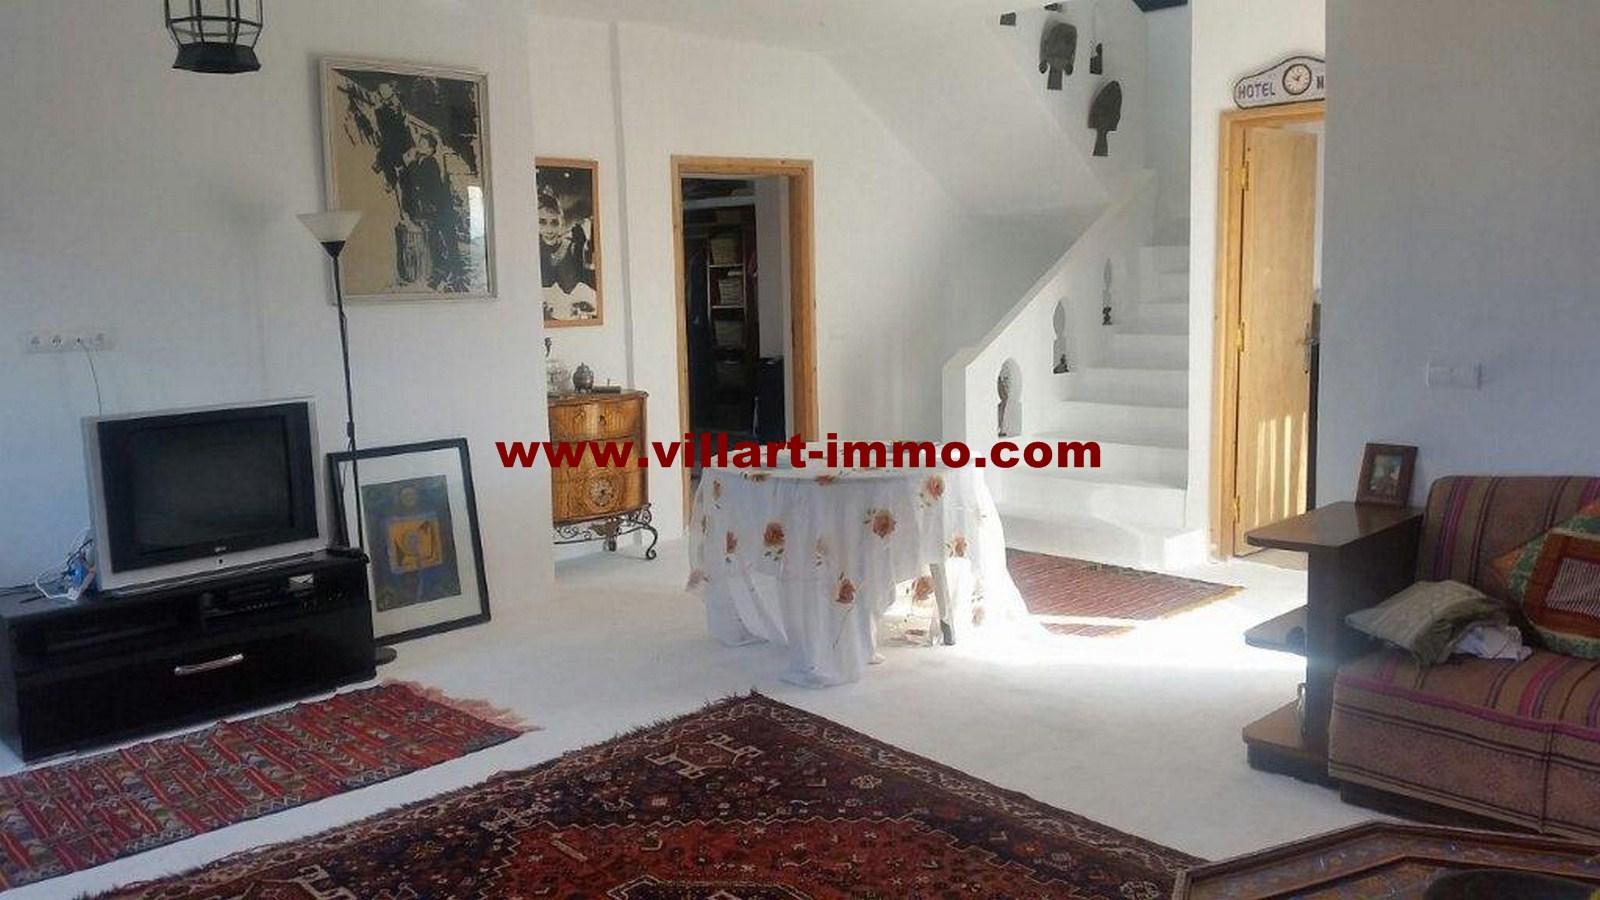 2-vente-villa-tanger-autres-salon-2-vv454-villart-immo